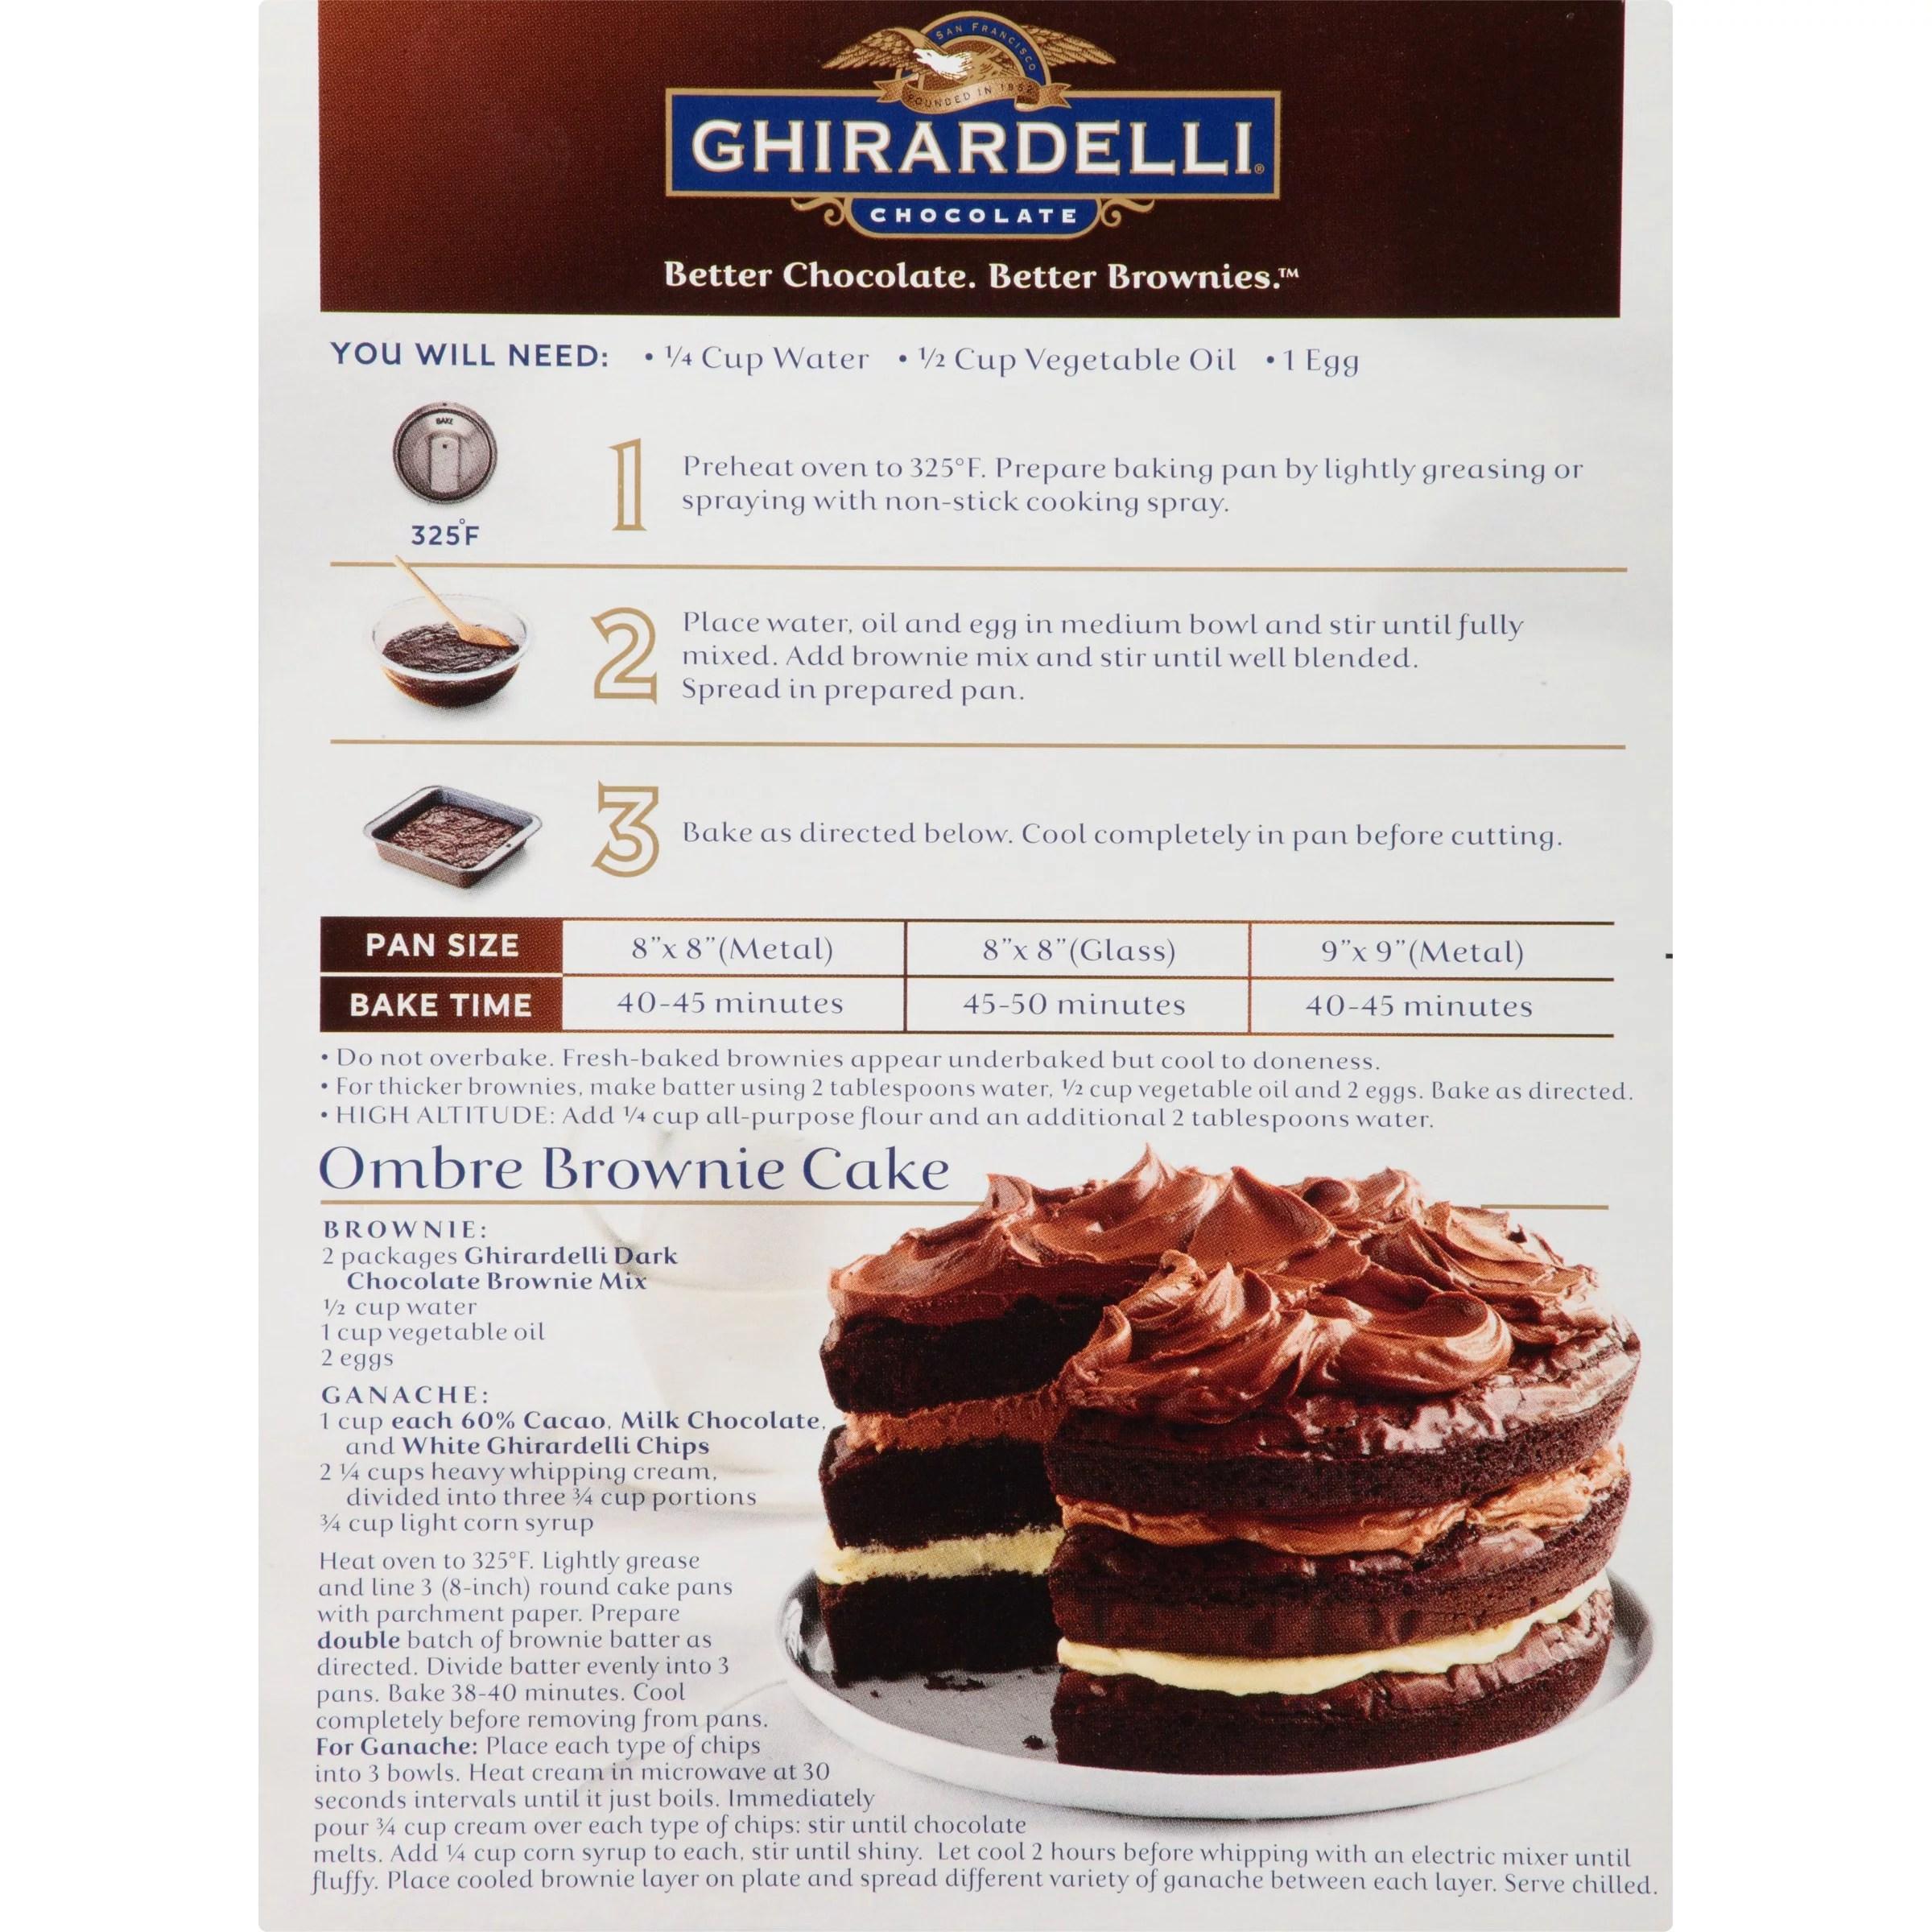 Recipes Using Ghirardelli Dark Chocolate Brownie Mix